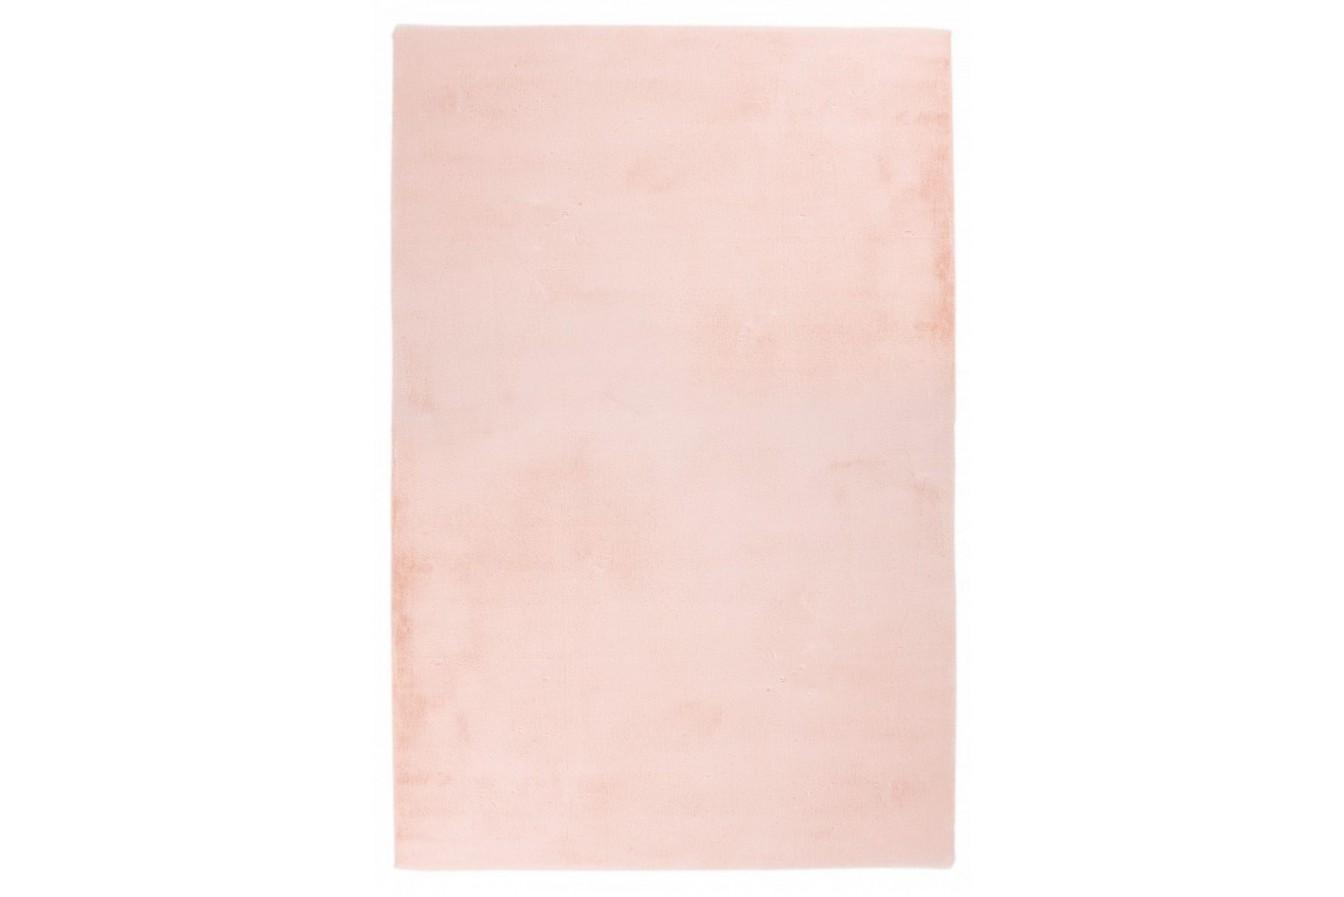 Sztuczne Futro Różowy Dywan Obsession Cha Cha 535 Pink